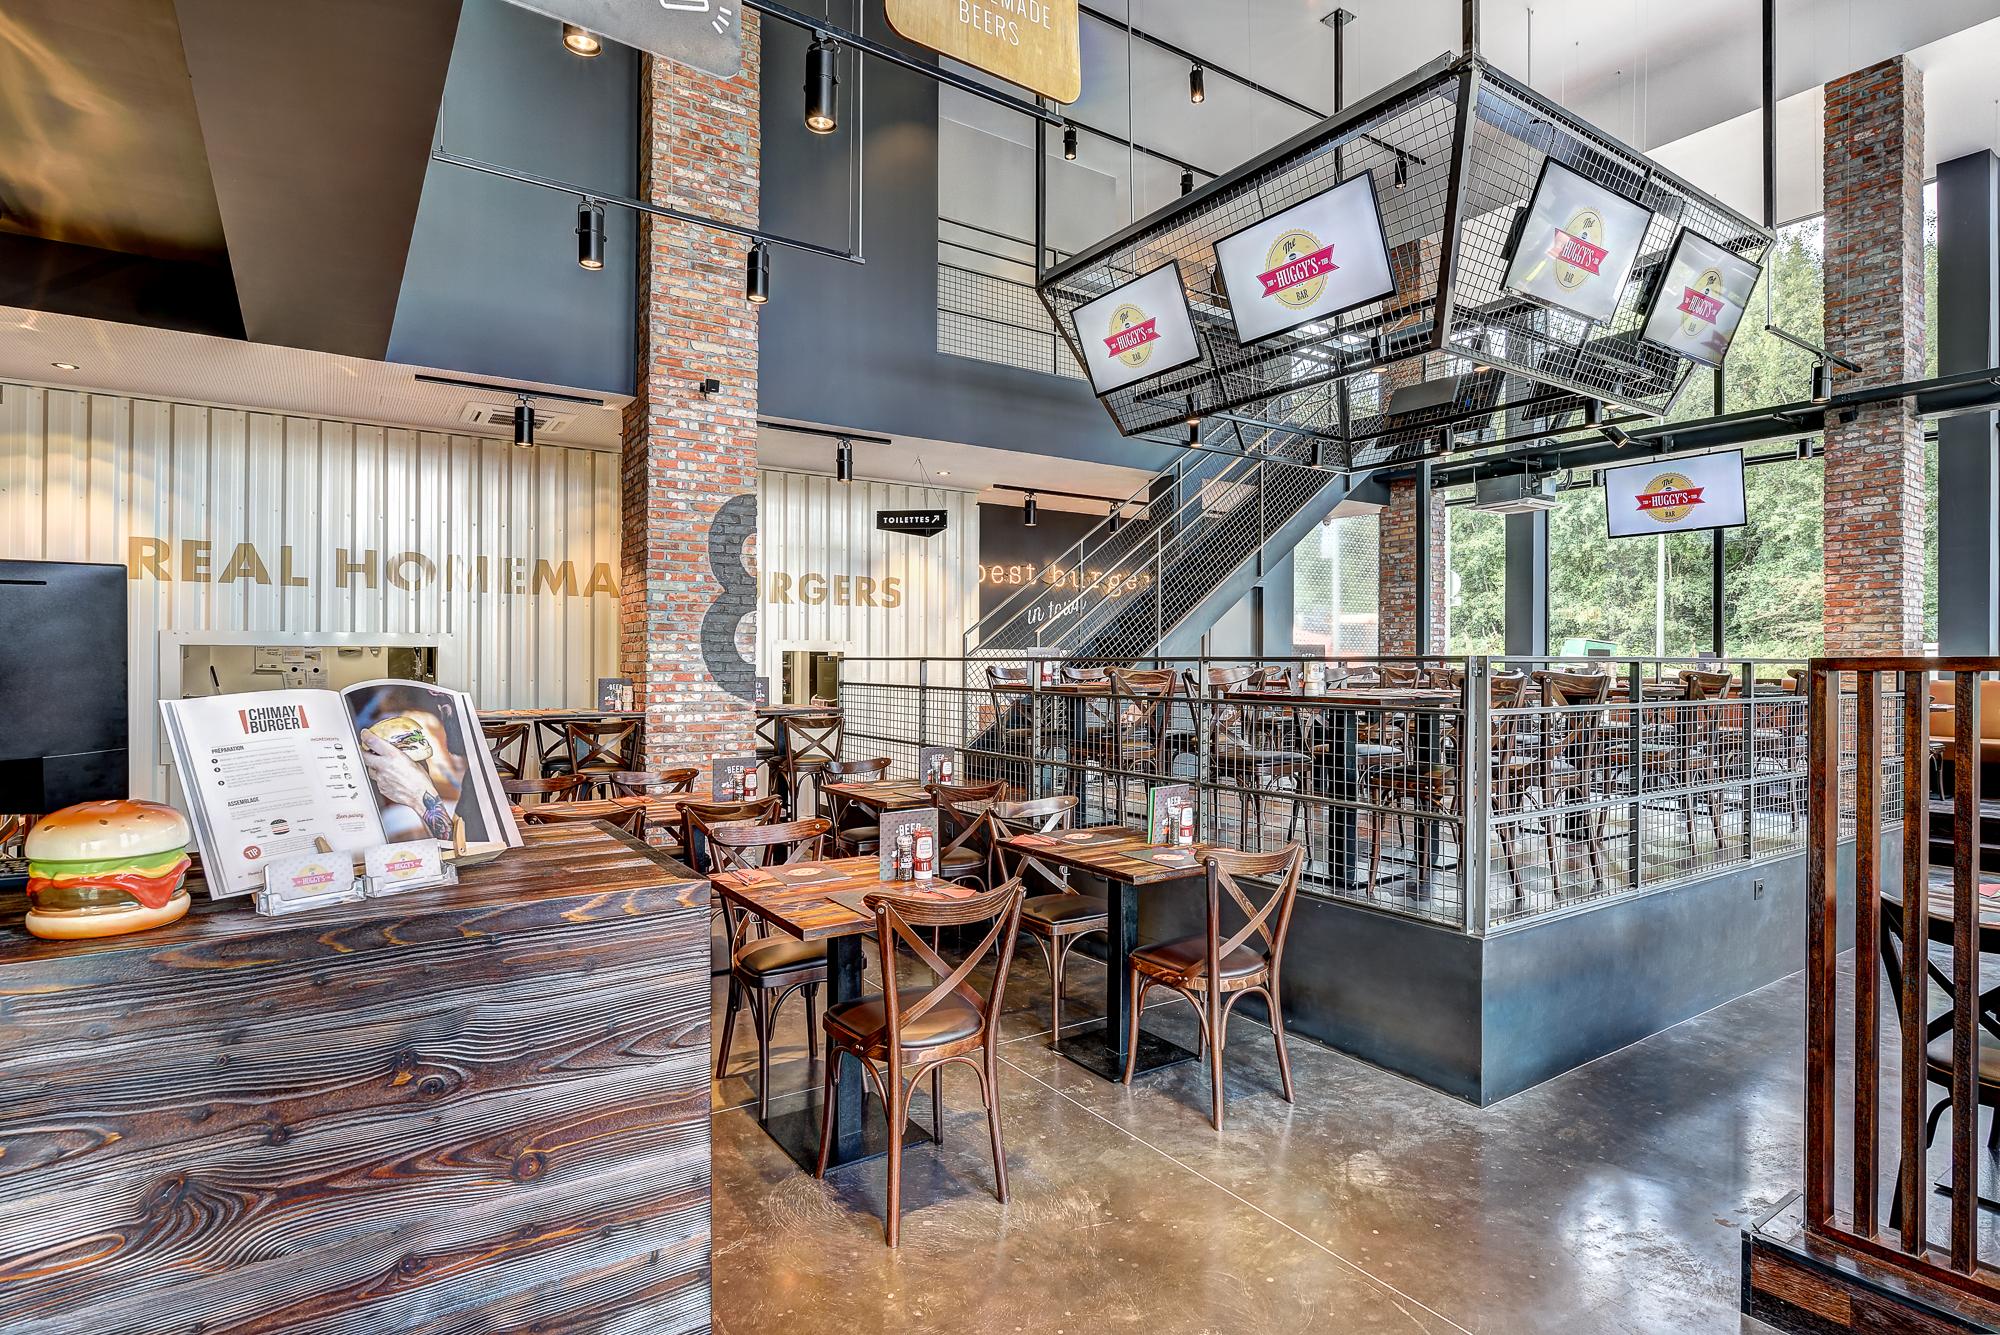 The Huggy's Bar - Sprimont